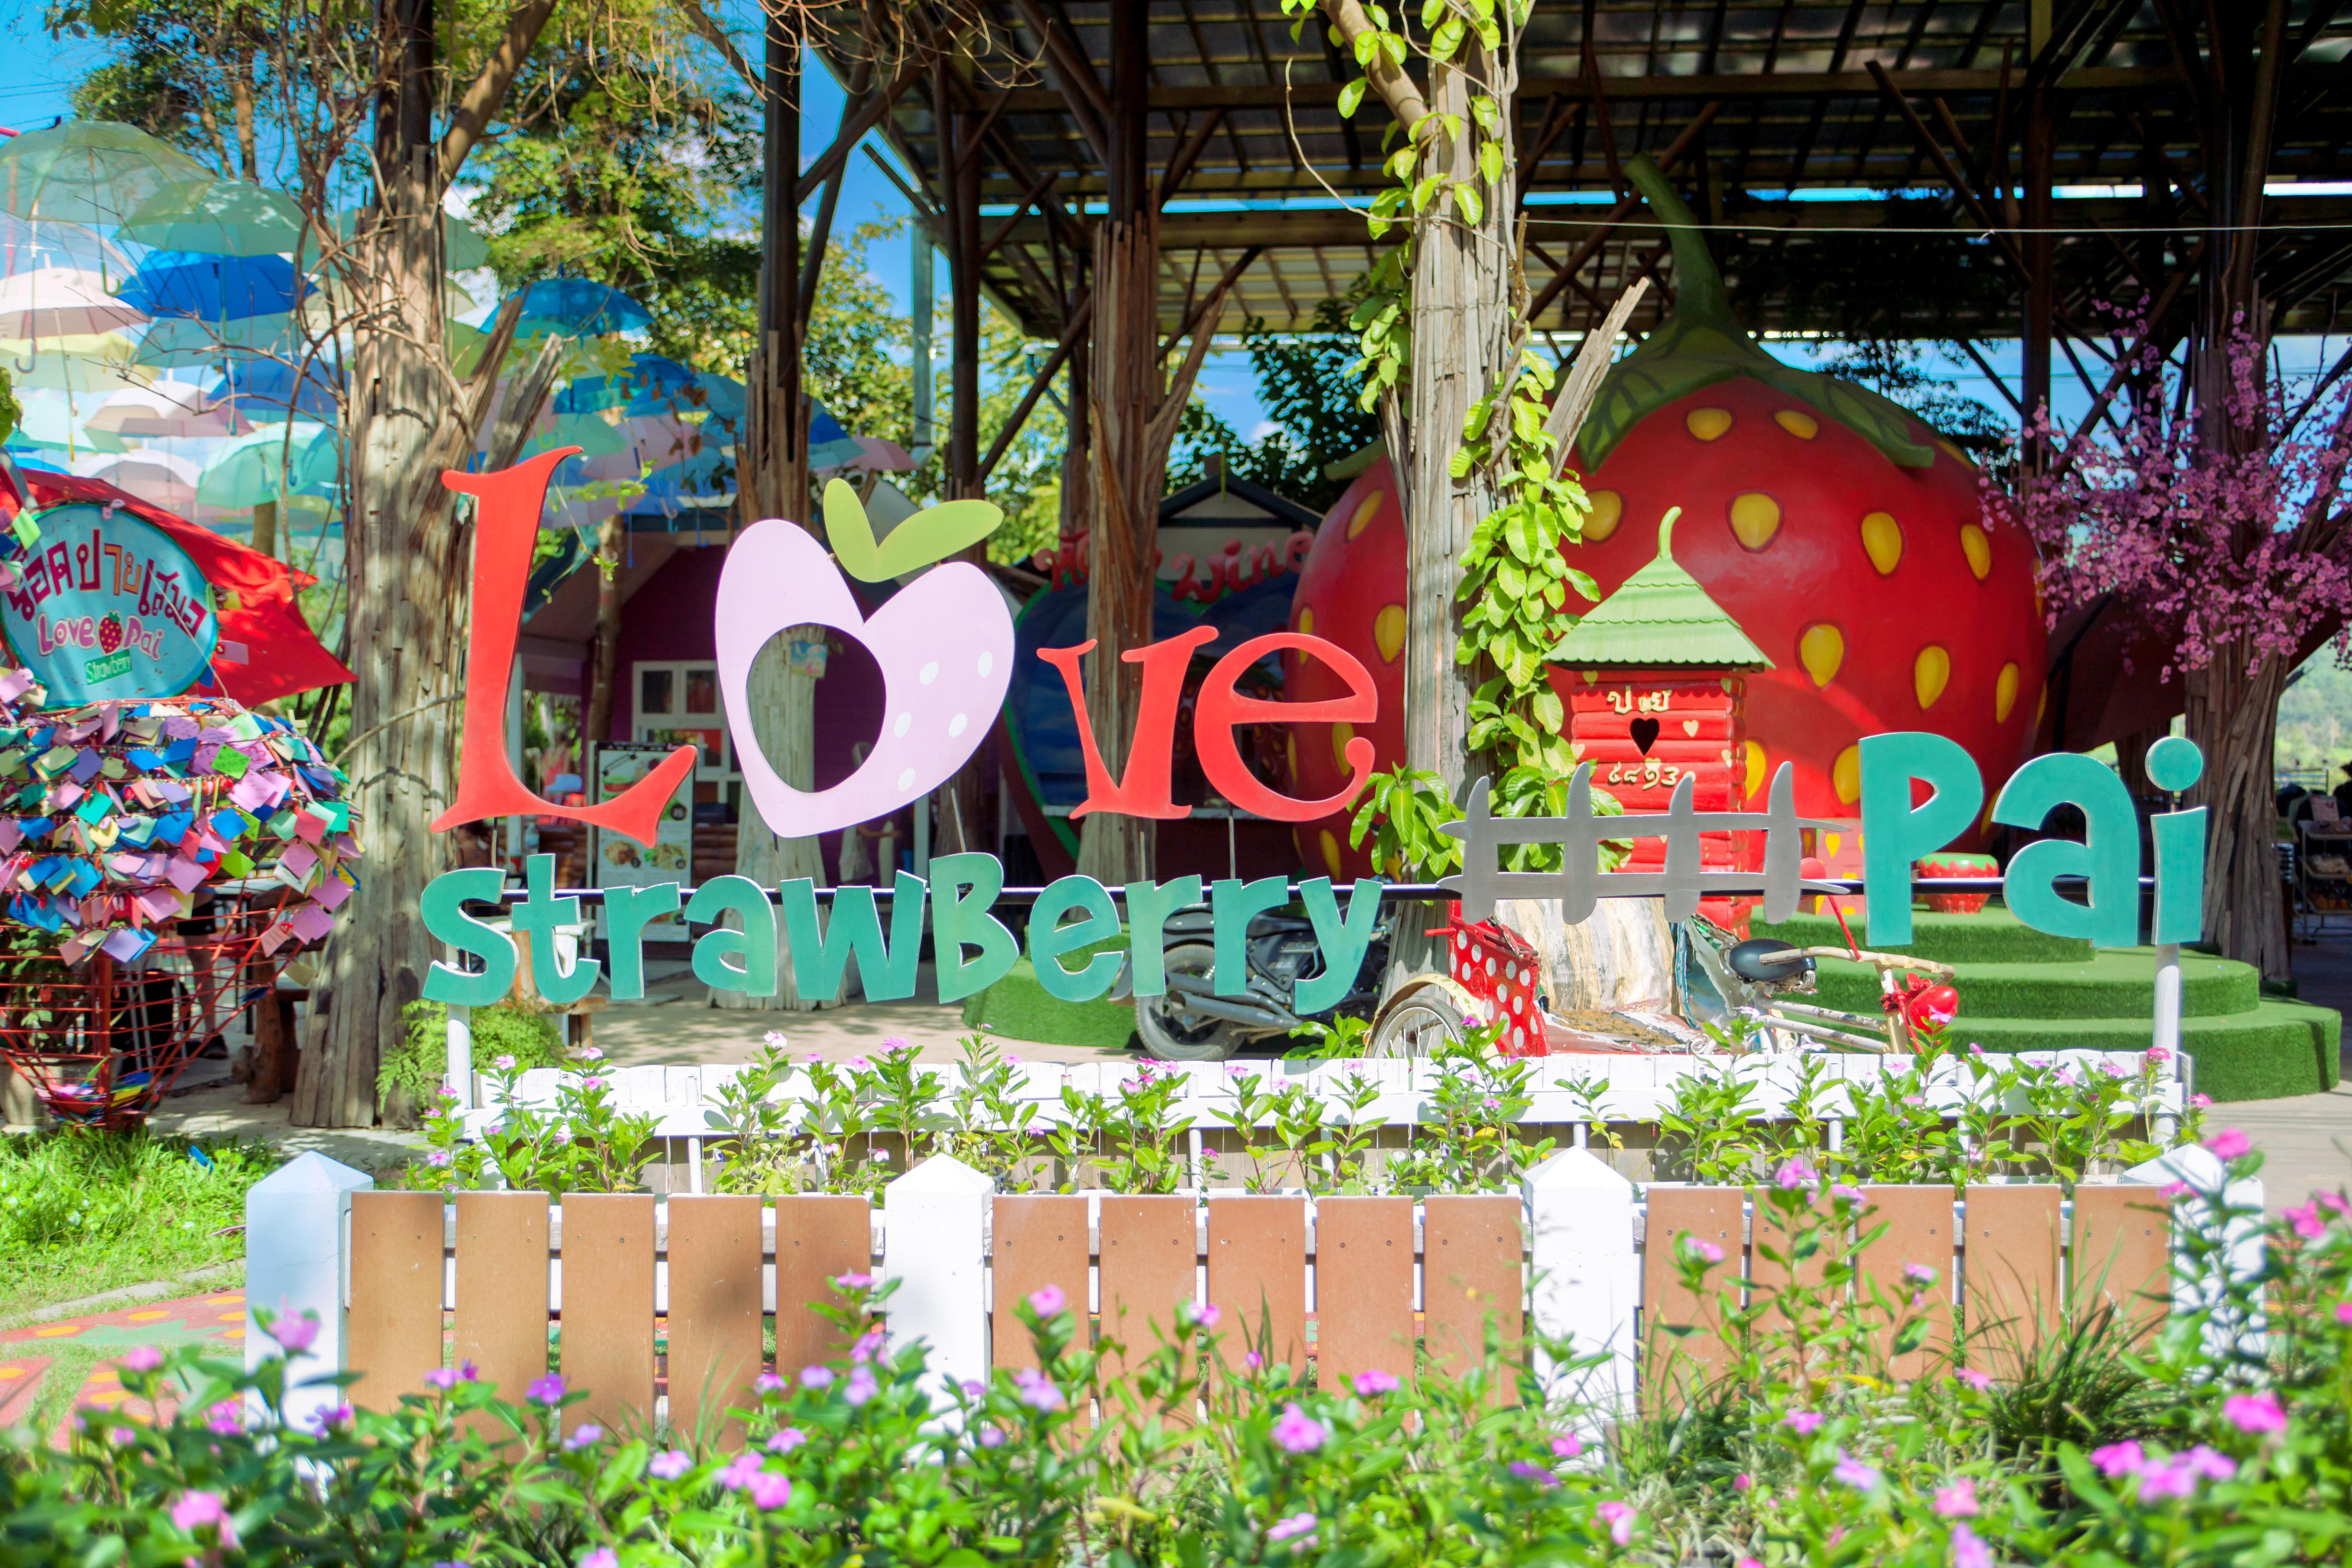 Love Strawberry Pai